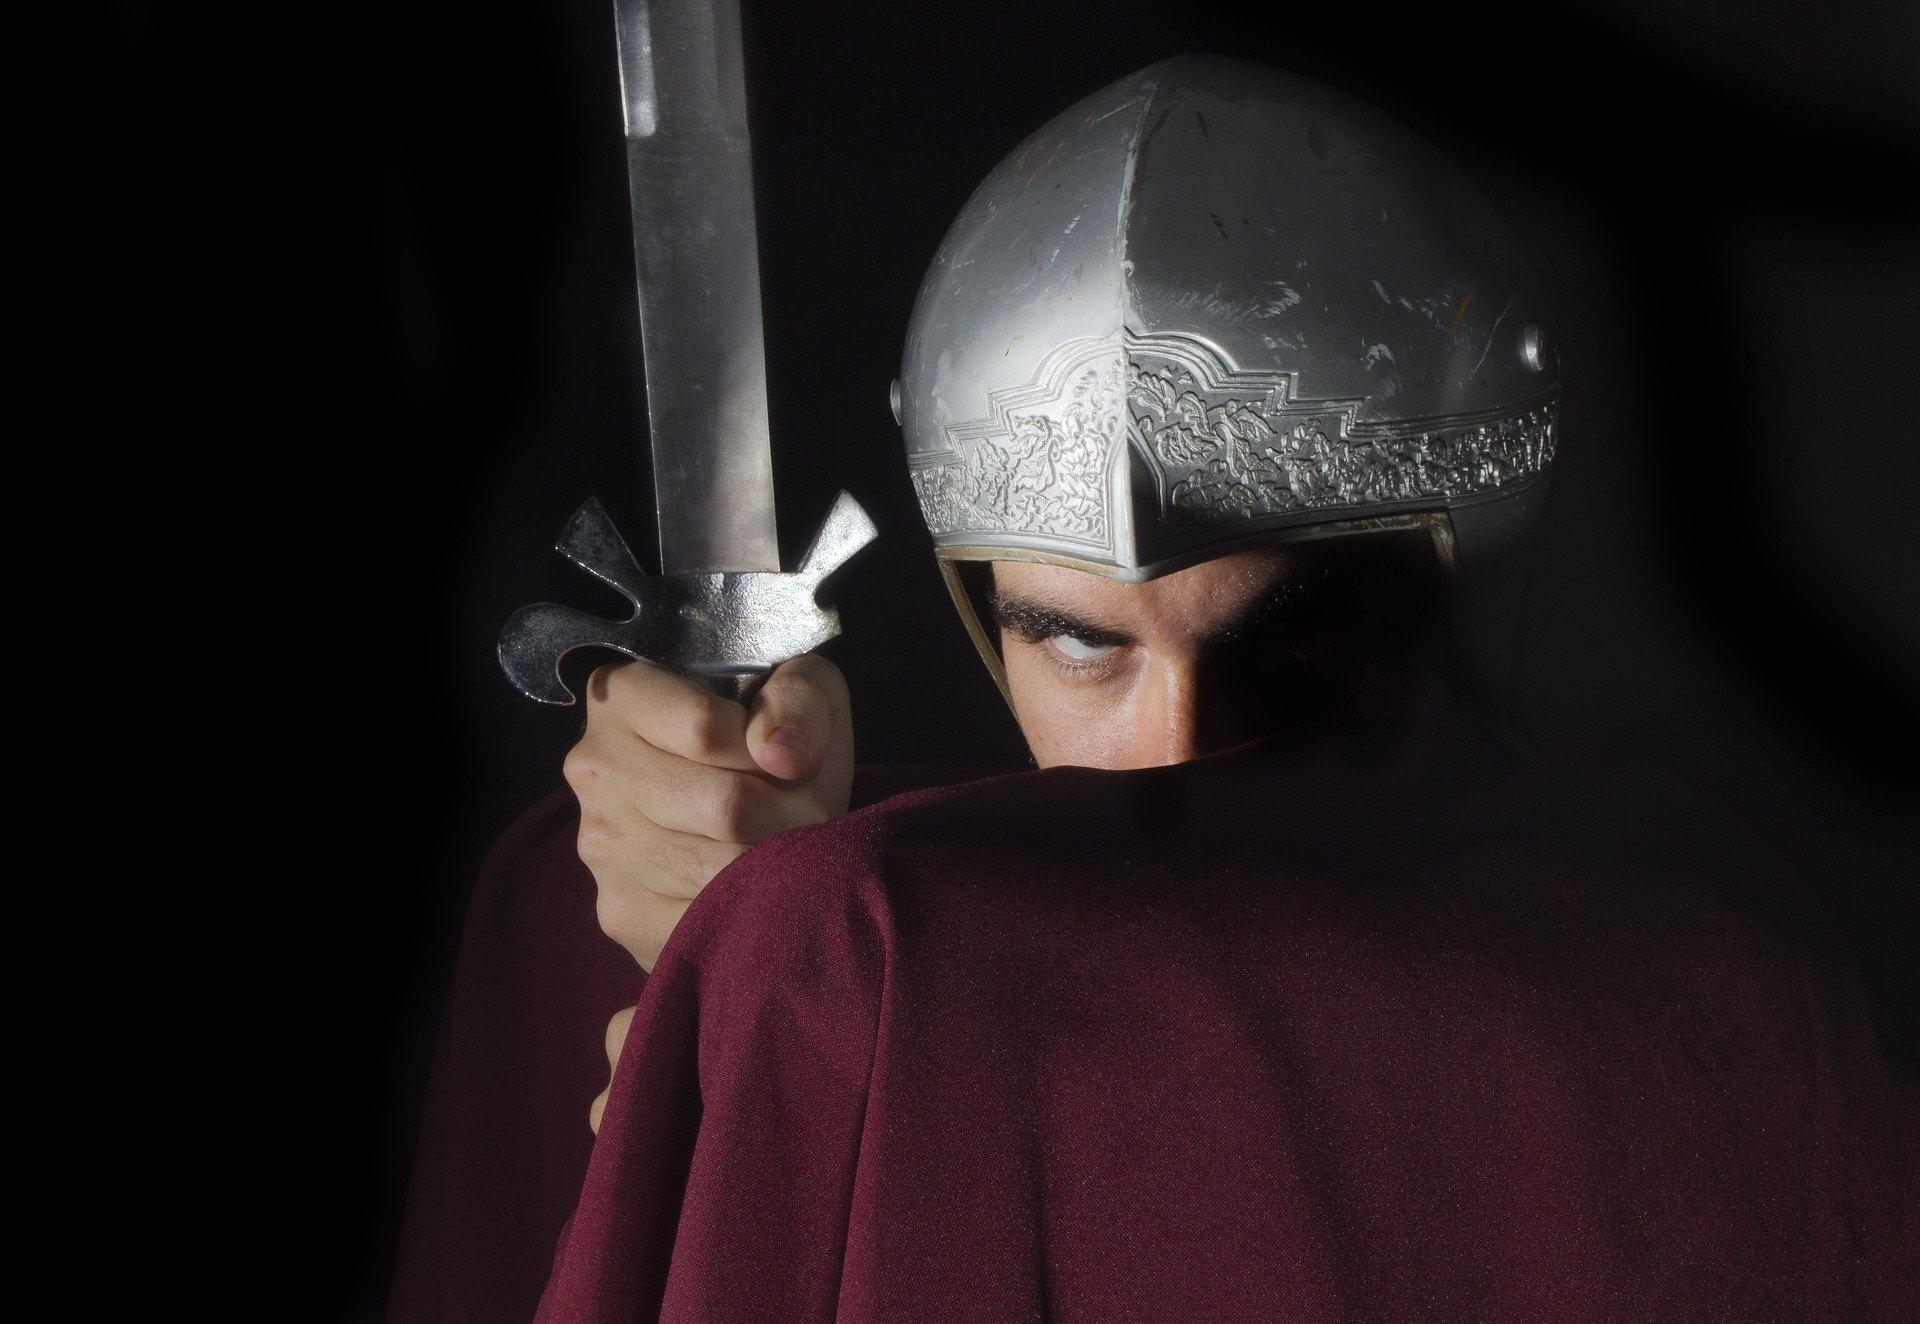 האם השר גלעד ארדן נלחם בשיימינג?